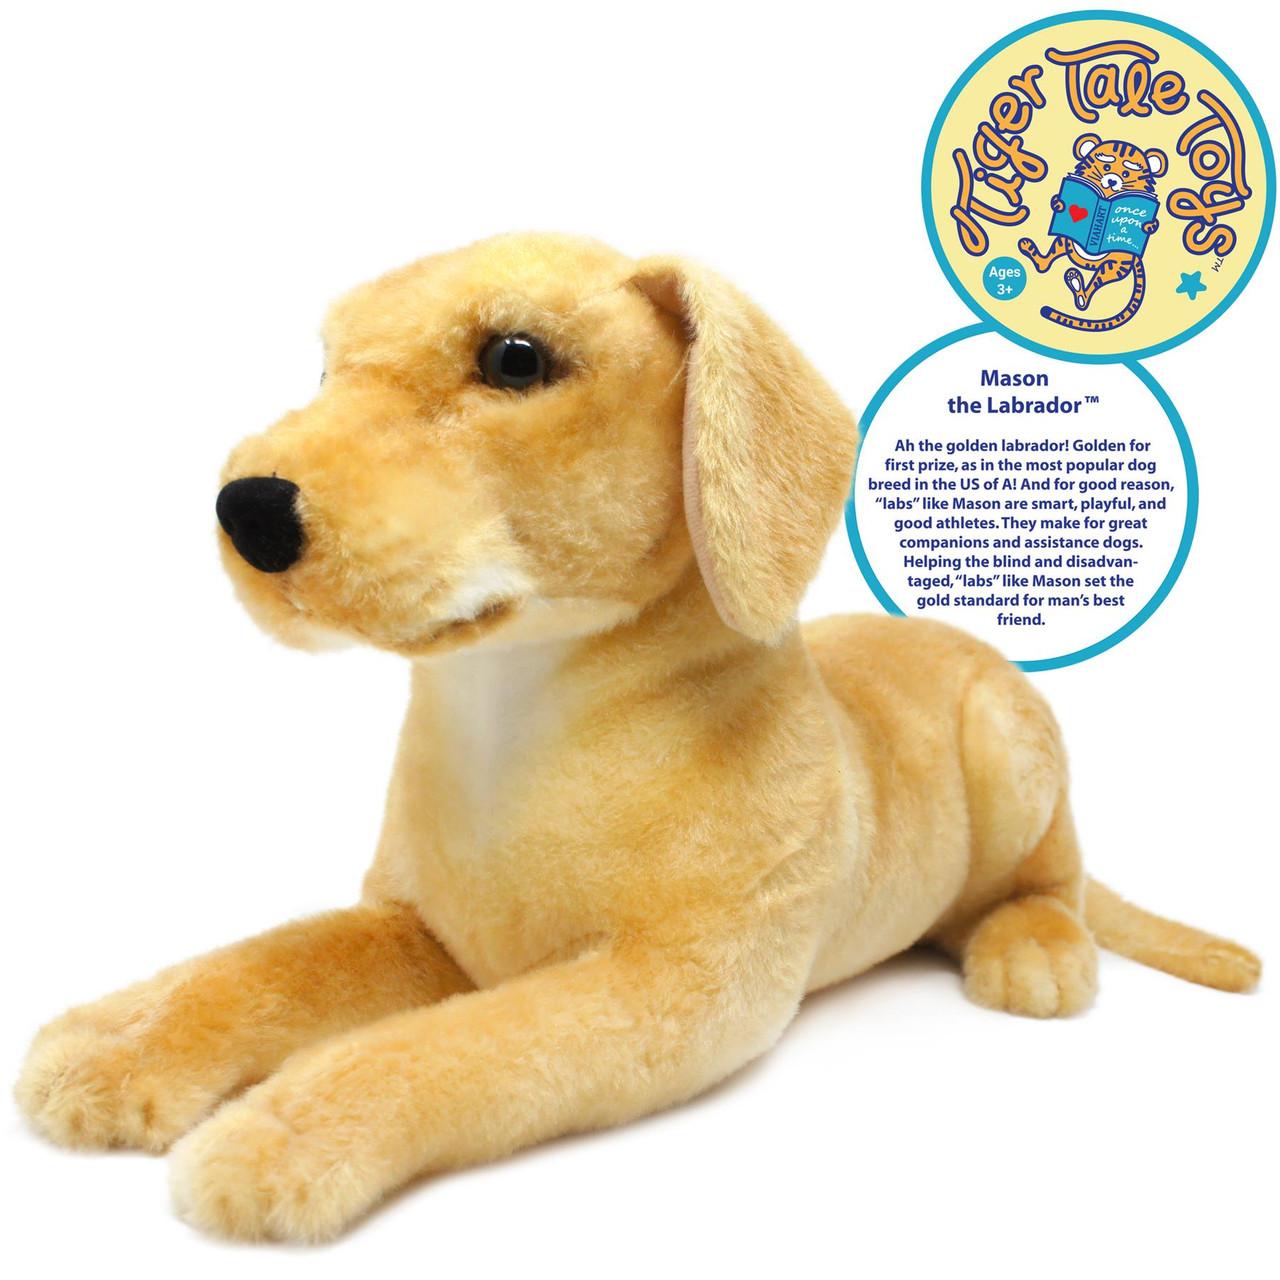 Set Of Dog Stuffed Animals, Mason The Labrador 19 Inch Large Labrador Dog Stuffed Animal Plush By Tiger Tale Toys Viahart Toy Co